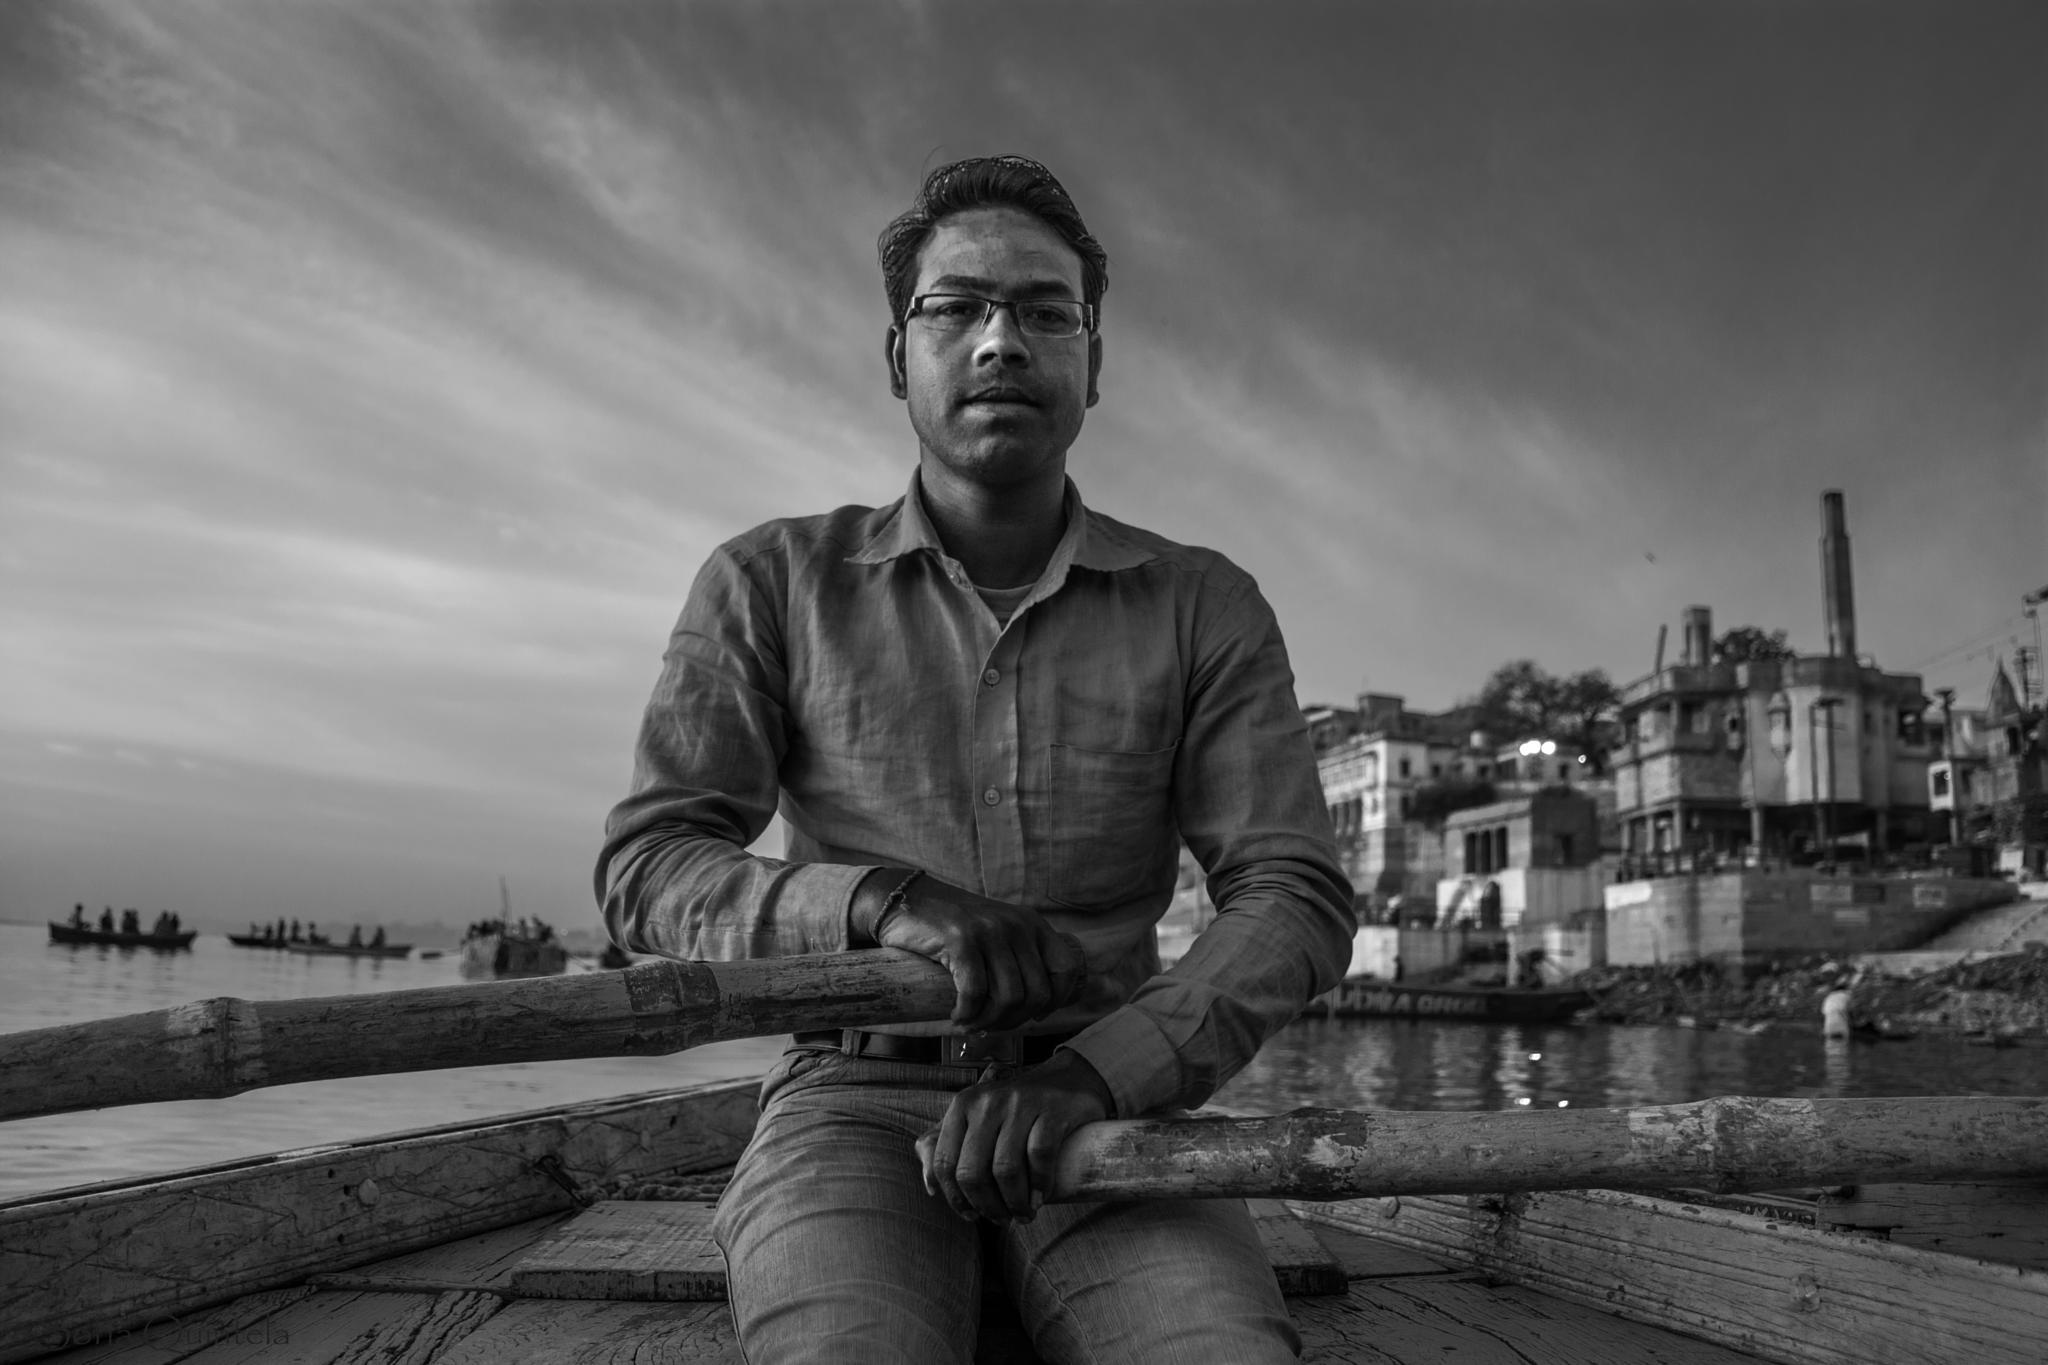 GangesBoatman by Sofia Quintela